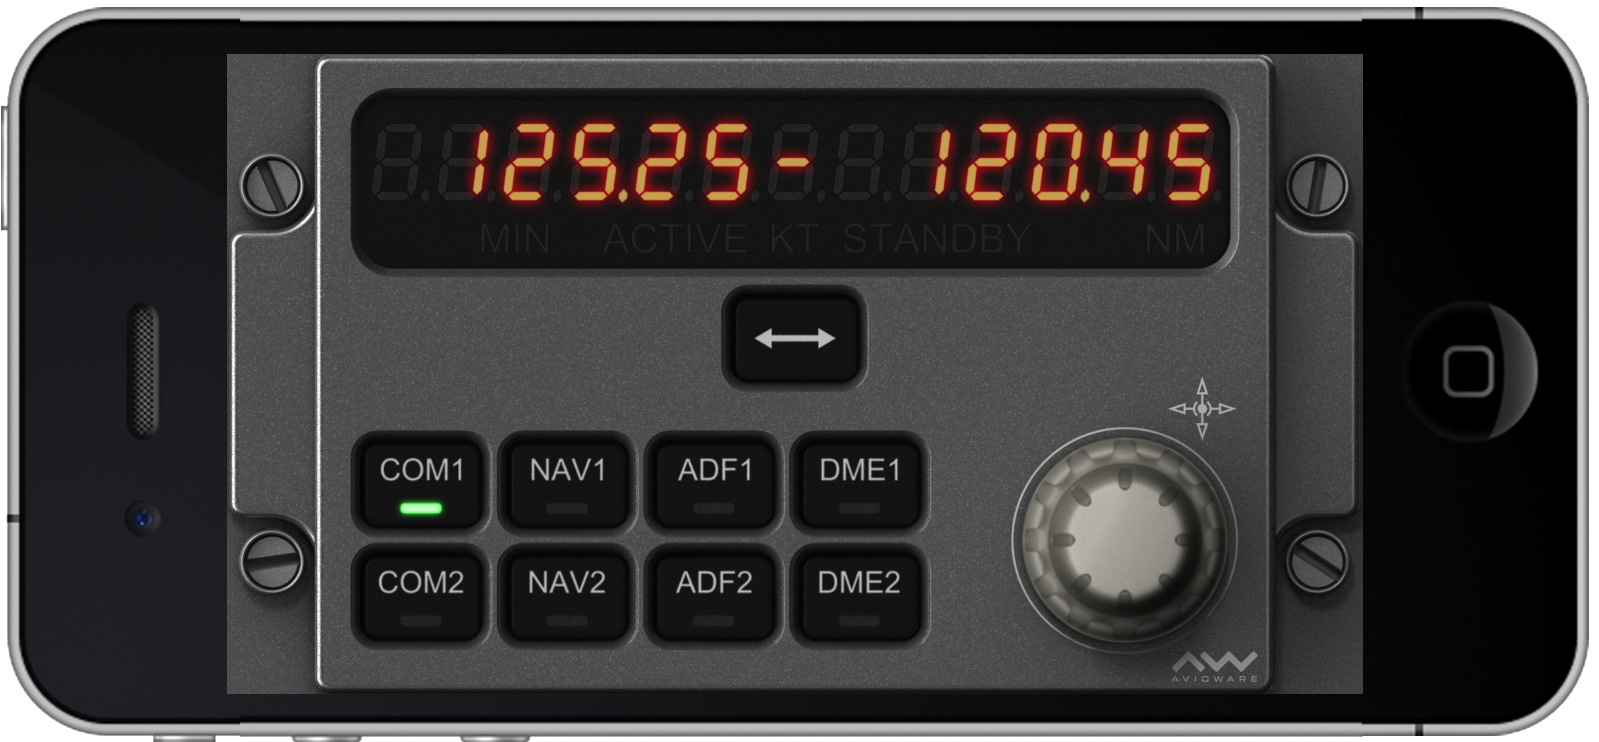 avioware com - Flight simulator instruments for iPad and Android